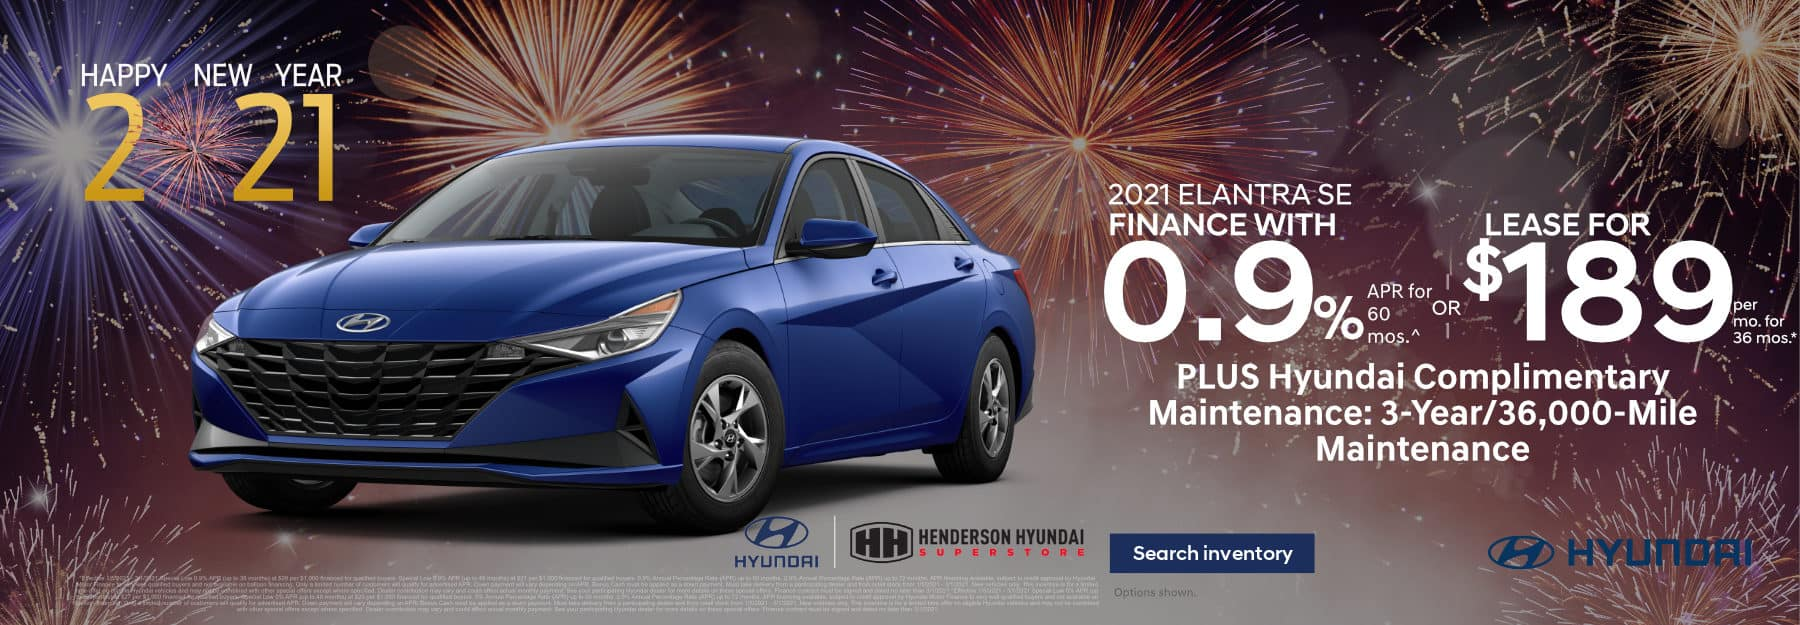 January_2021_Elantra_Henderson_Hyundai